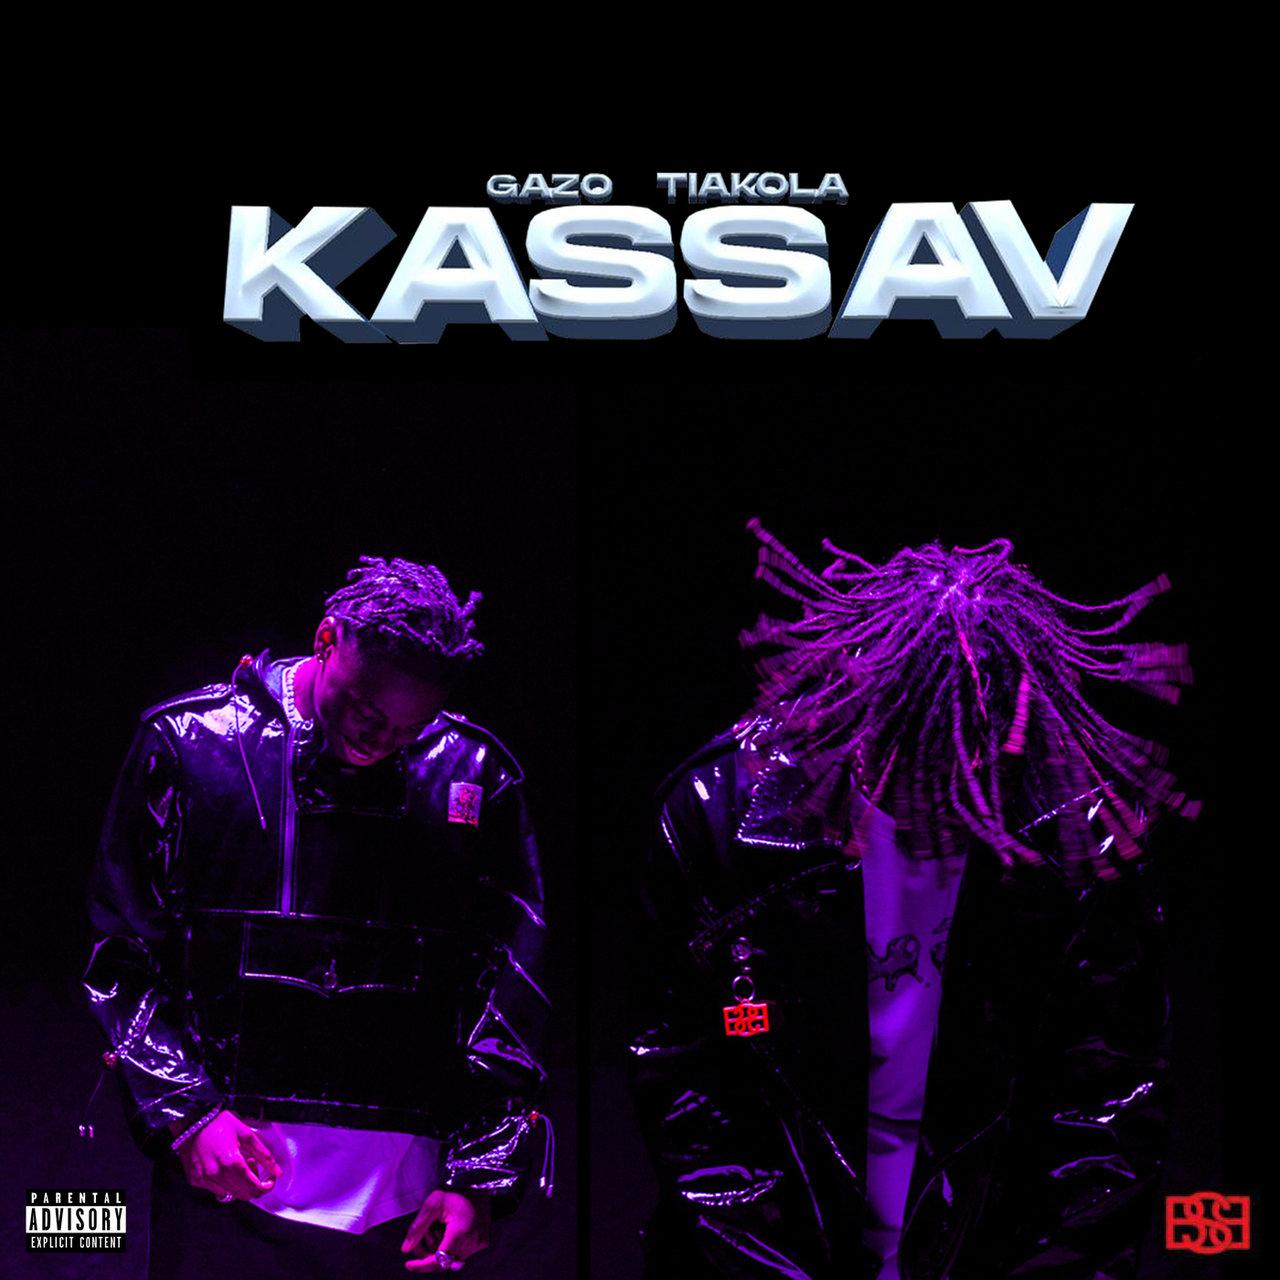 Gazo - Kassav (ft. Tiakola) (Cover)